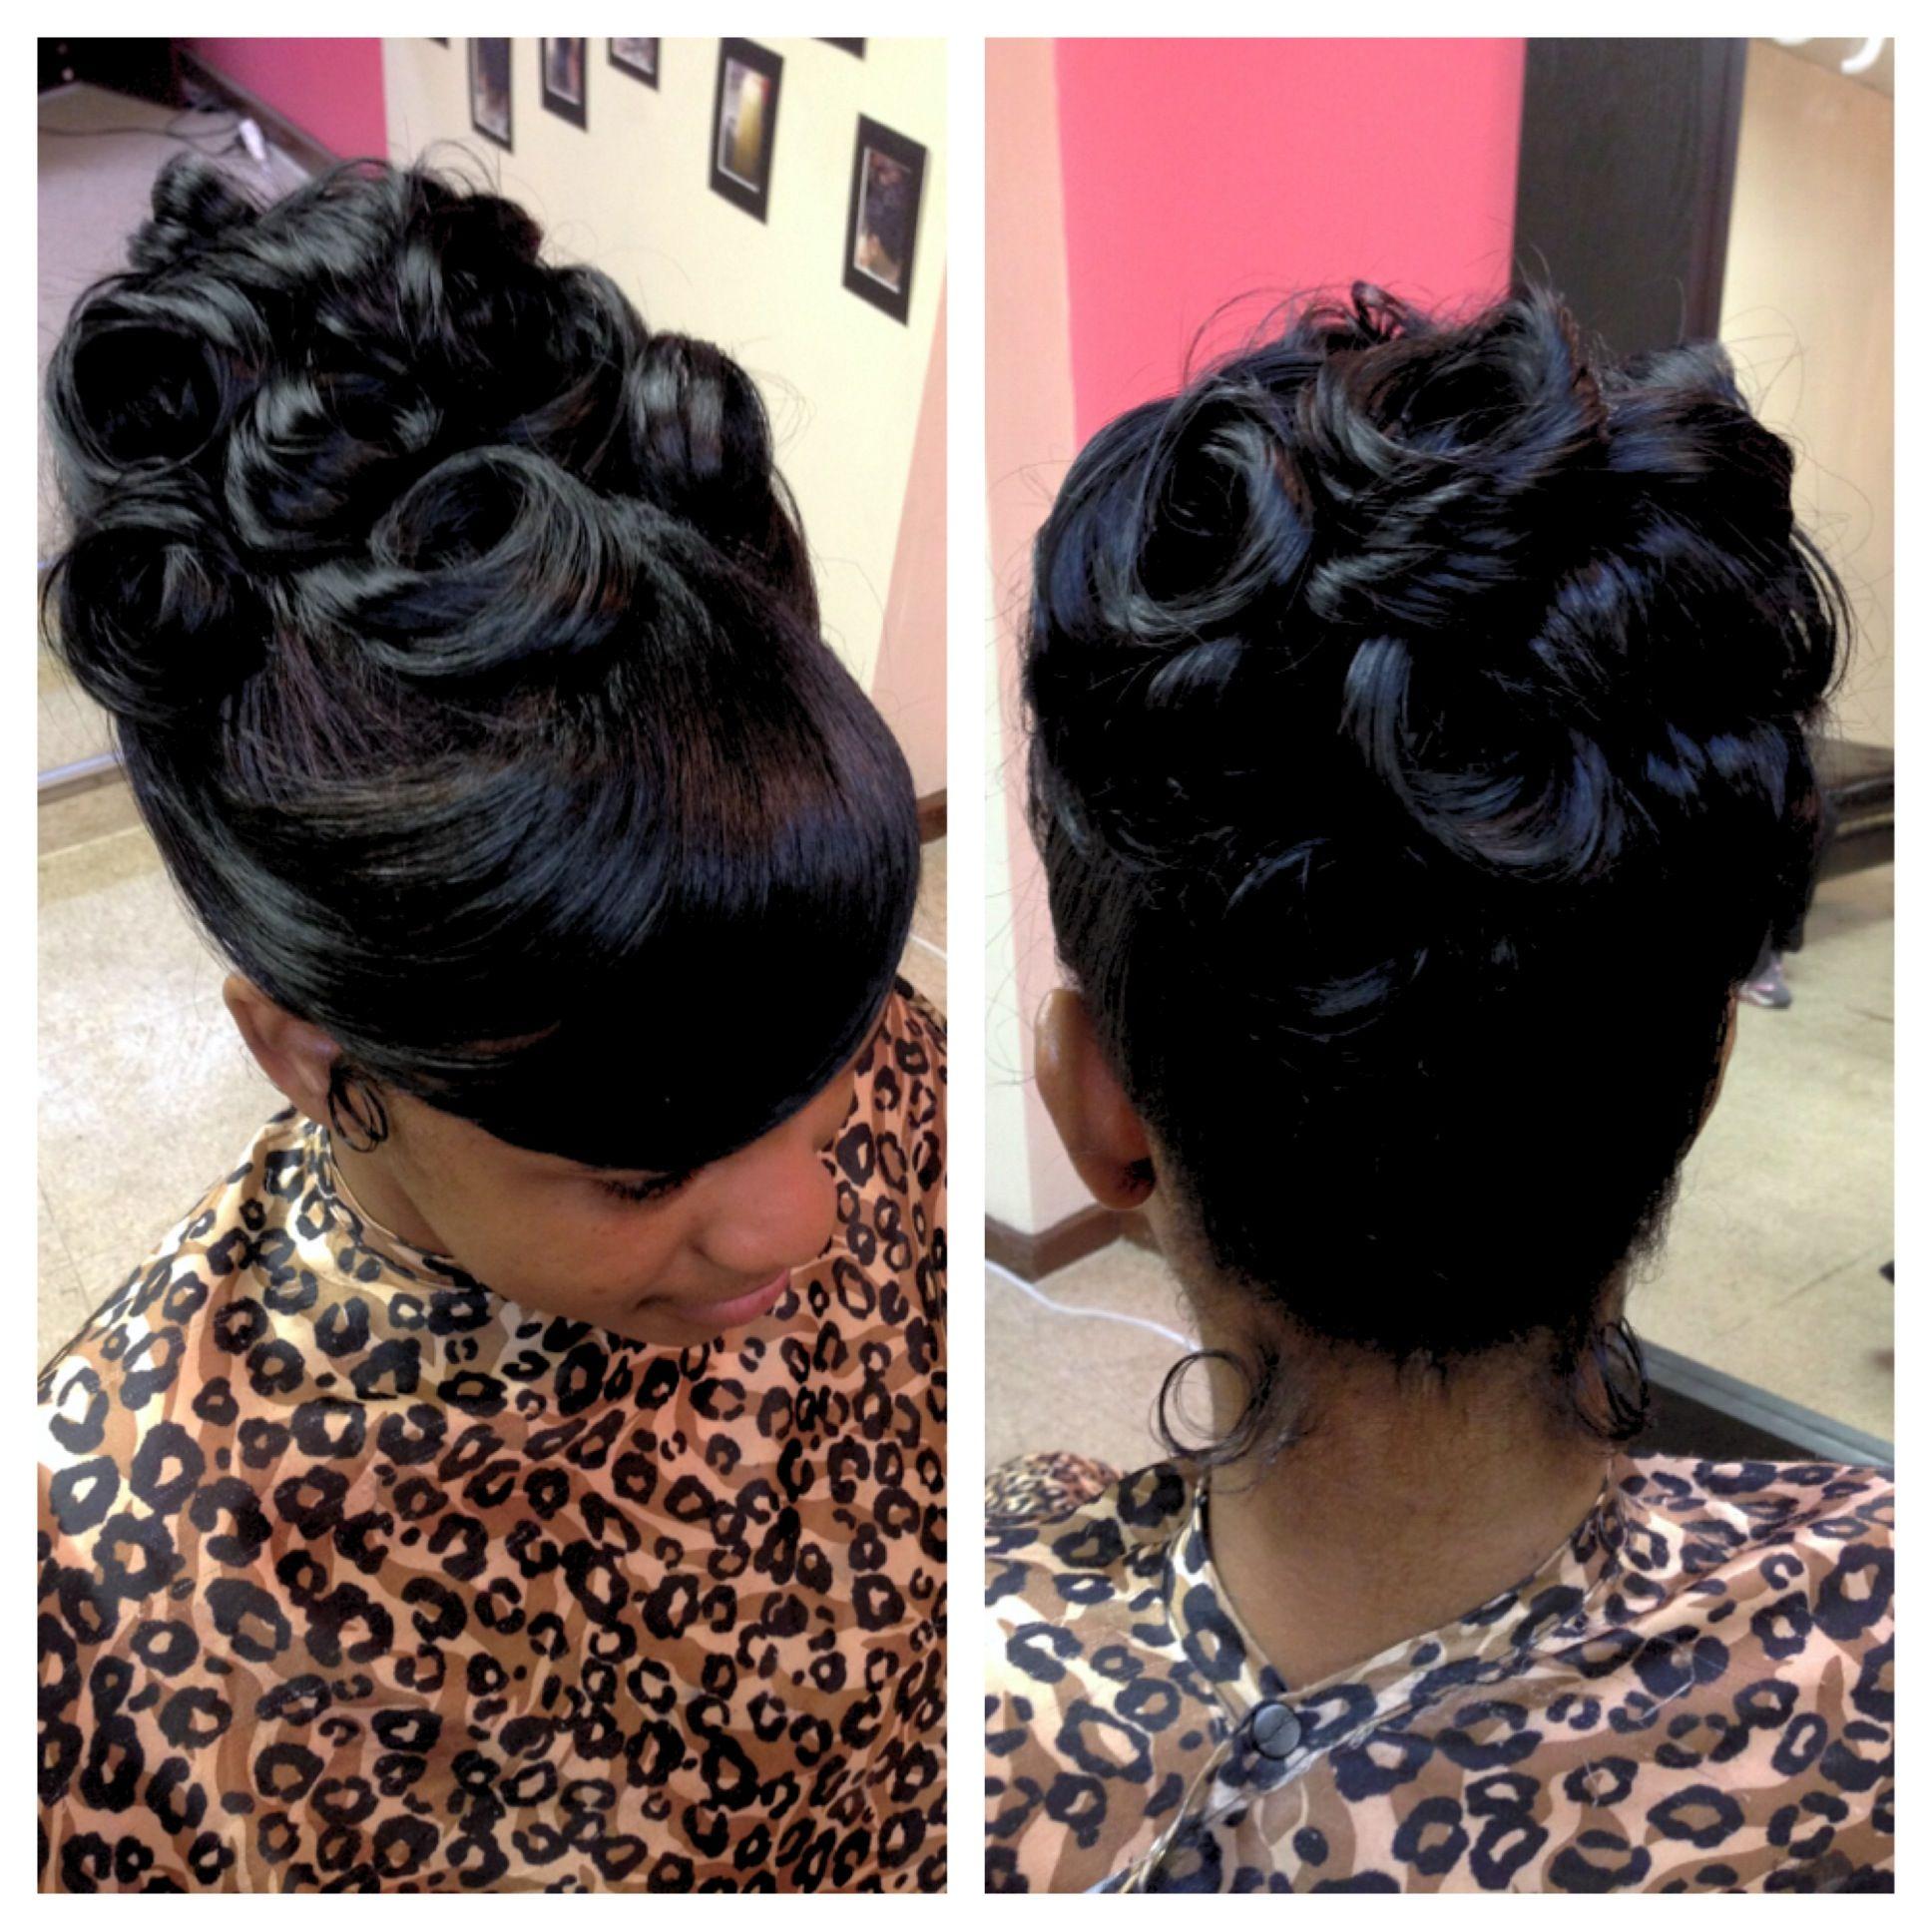 Up Do Bun With Curls Fabulous 3 Gamfactoryhairsalon Releaseyourinnerglam Glam Masterstylistnicky Prom Hairstyles Hair Styles Diy Hair Bun Prom Hair